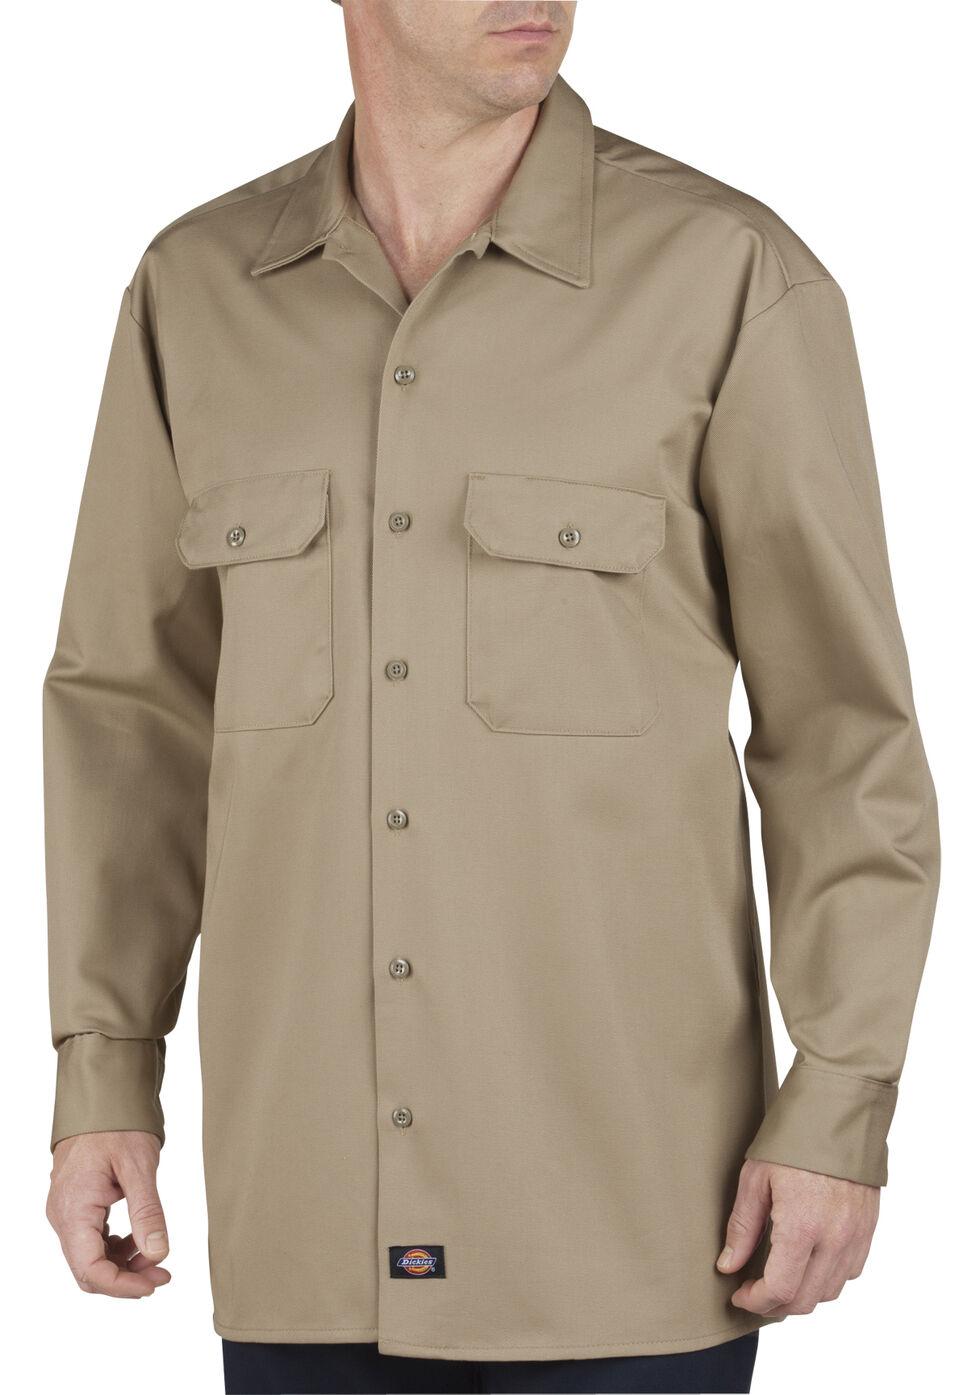 Dickies Heavyweight Cotton Work Shirt Big And Tall Khaki Hi Res